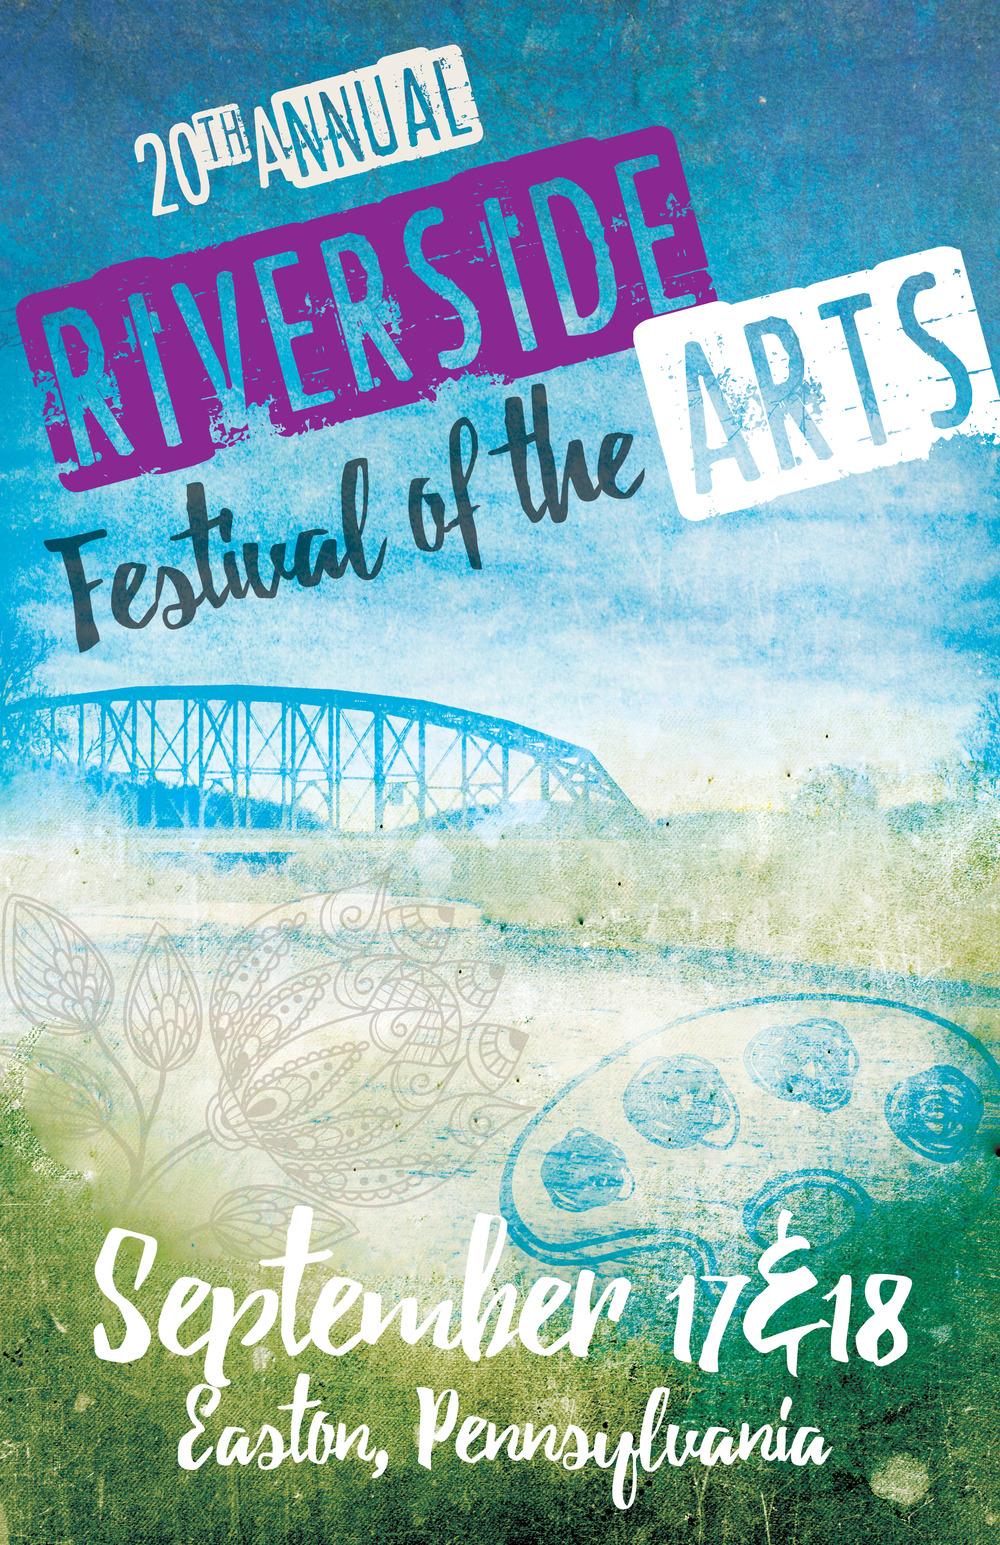 RiversidePoster.jpg